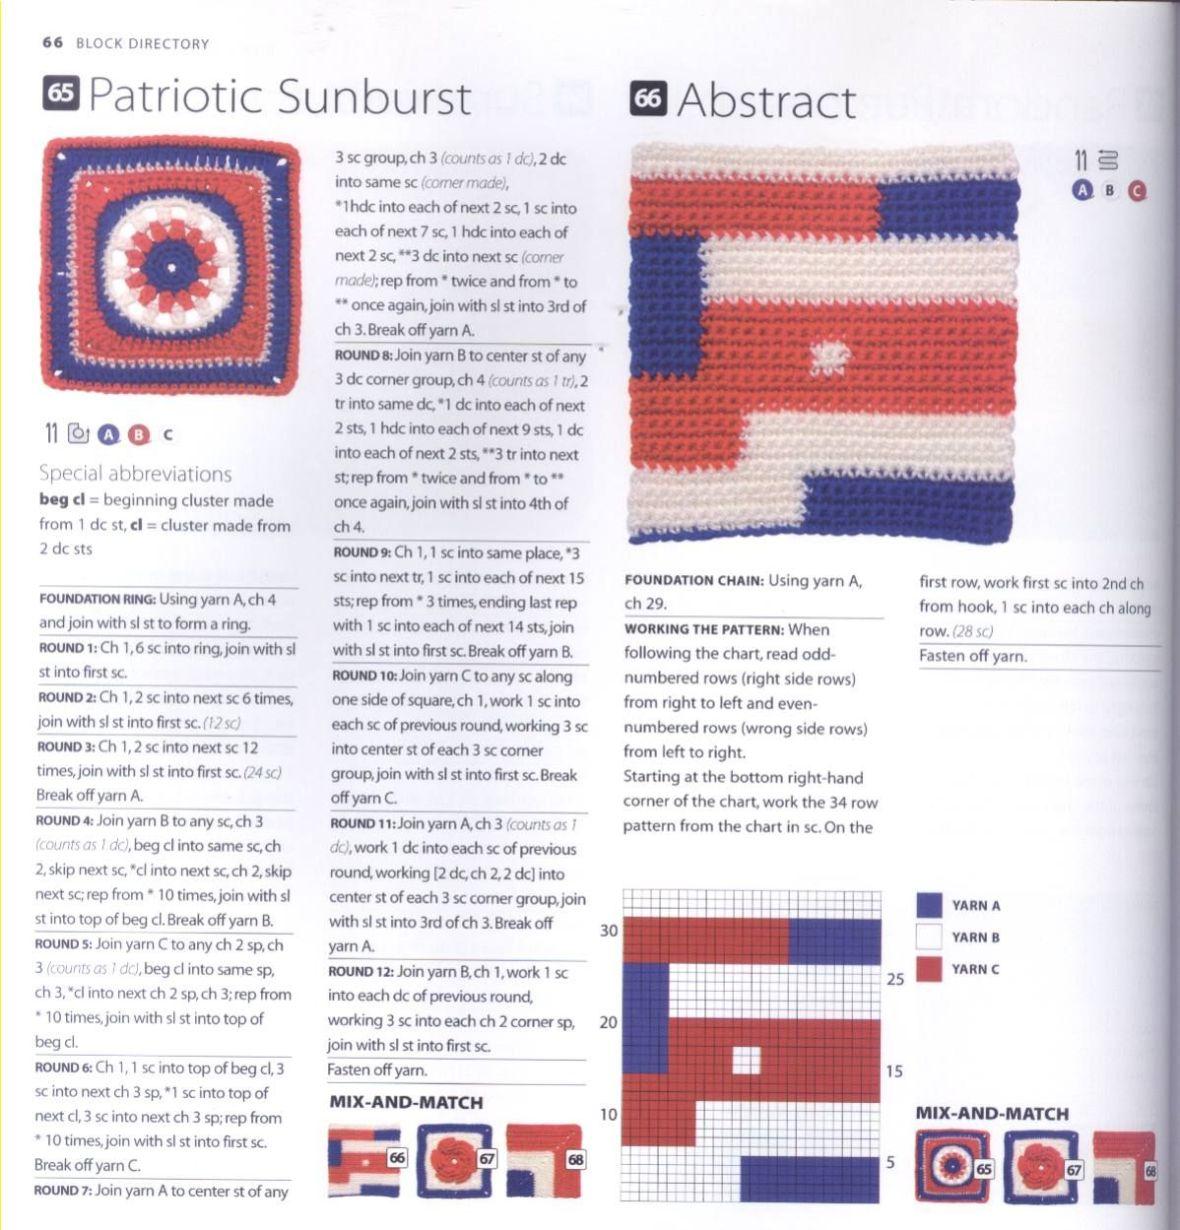 200 Crocheted Blocks for blankets, throws & Afghans 066